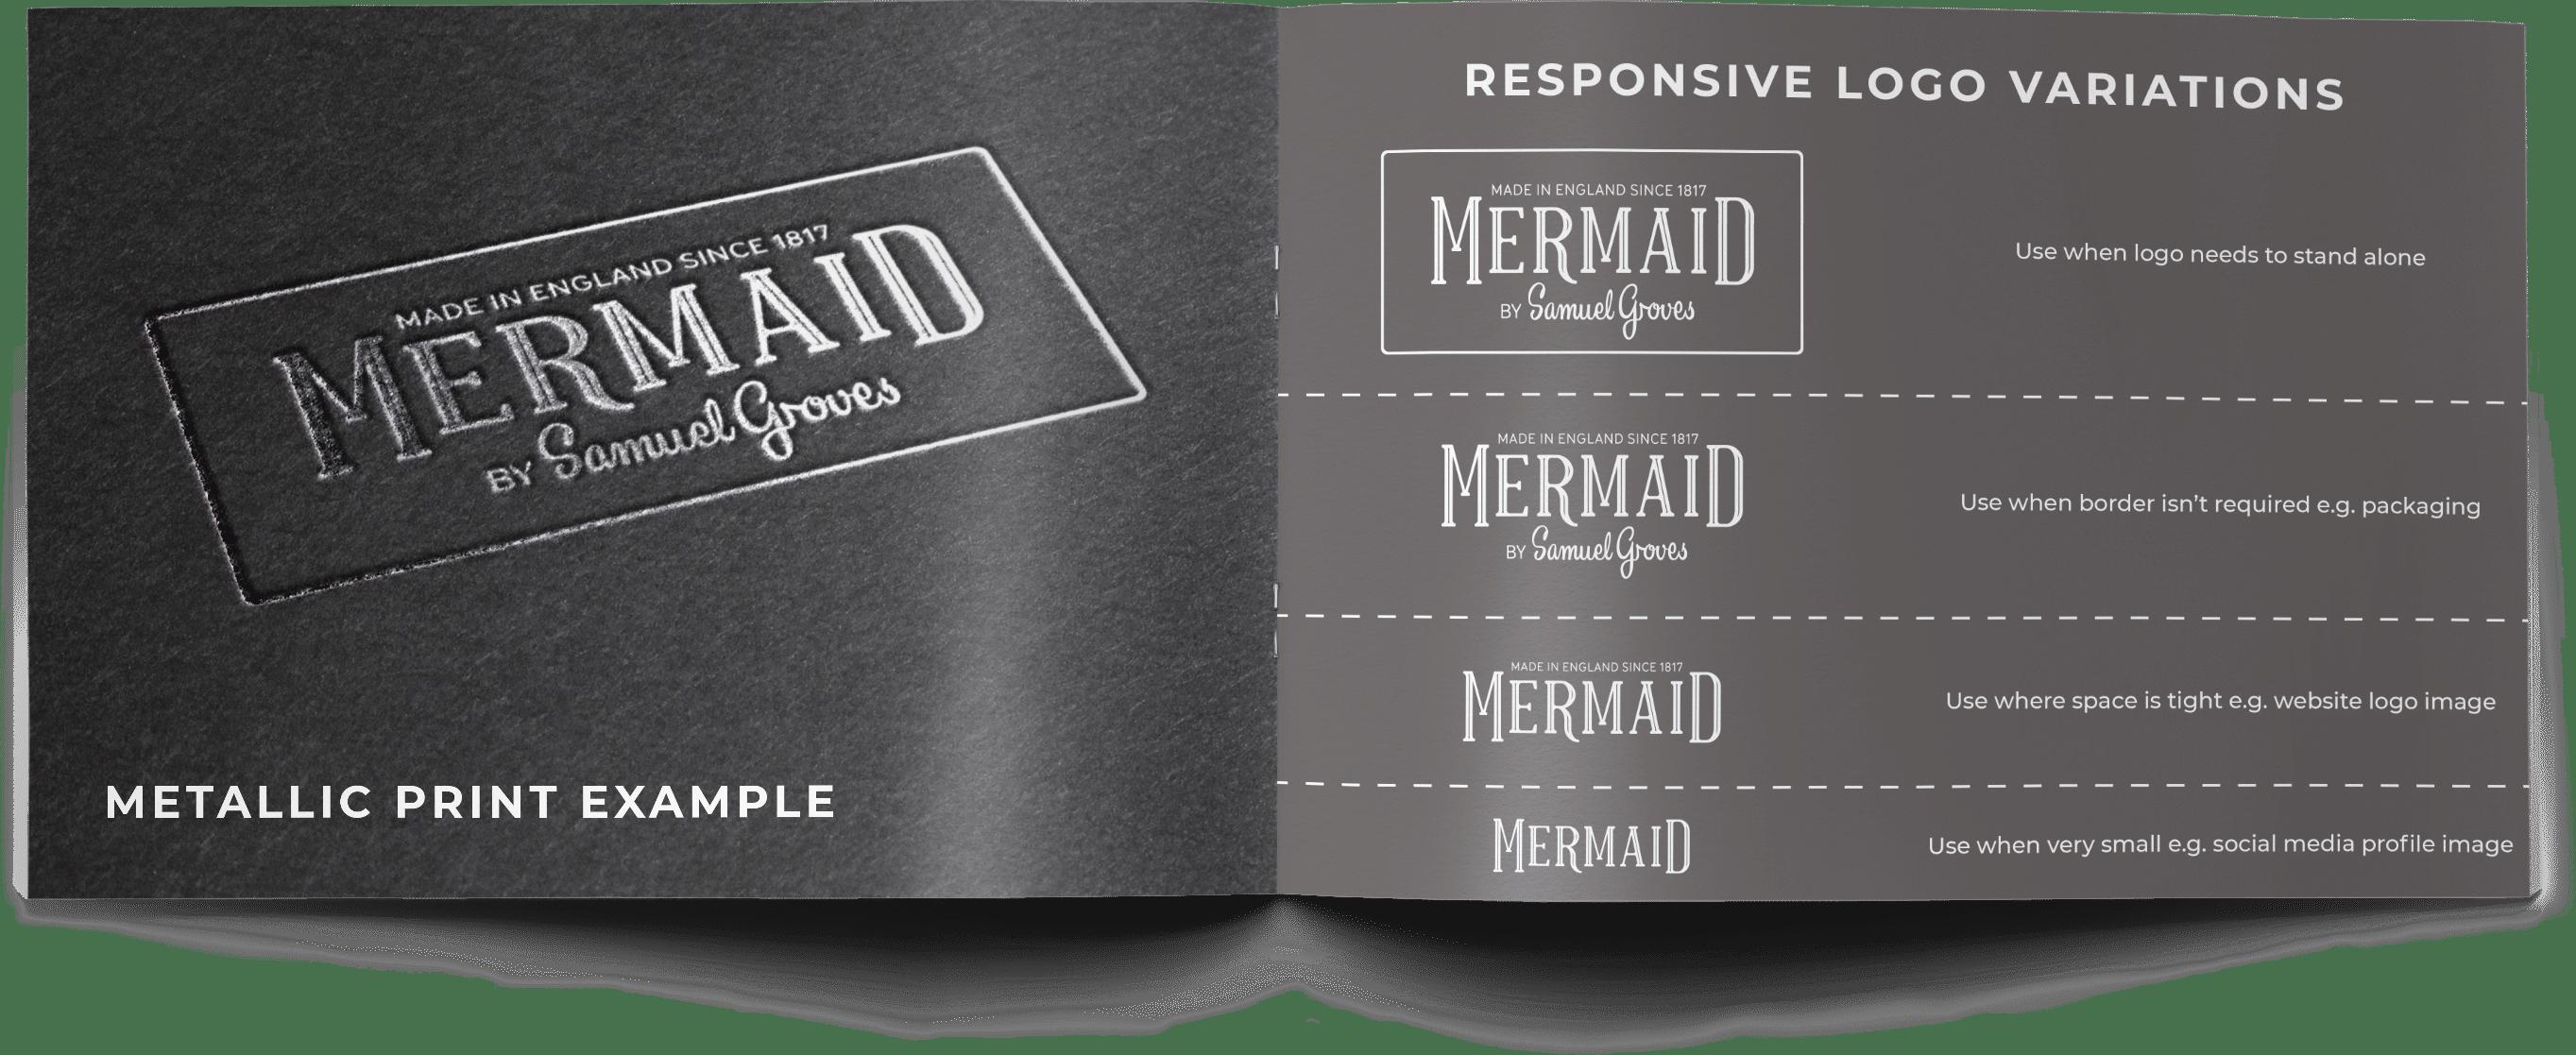 mermaid bakeware product packaging brand guidelines, logo variations pages